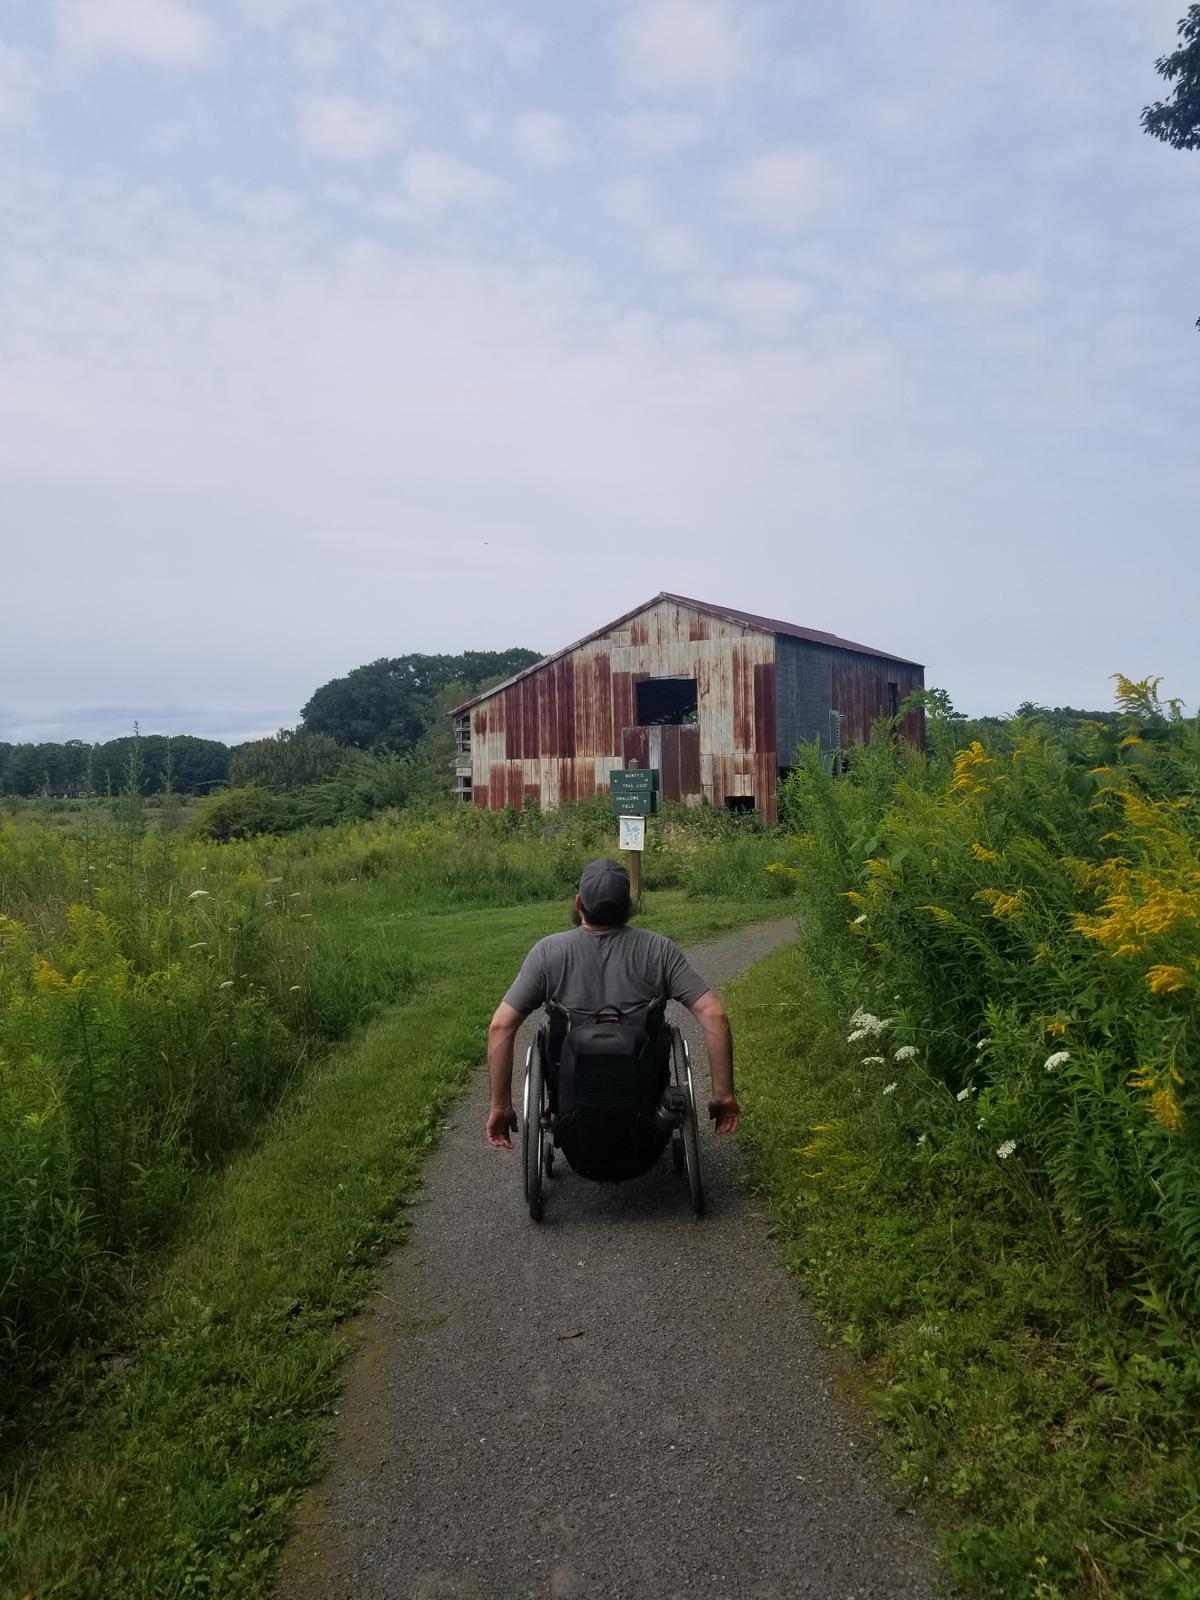 Enock heading toward the old barn at Pleasant Hill Preserve. Photo credit: Enock Glidden